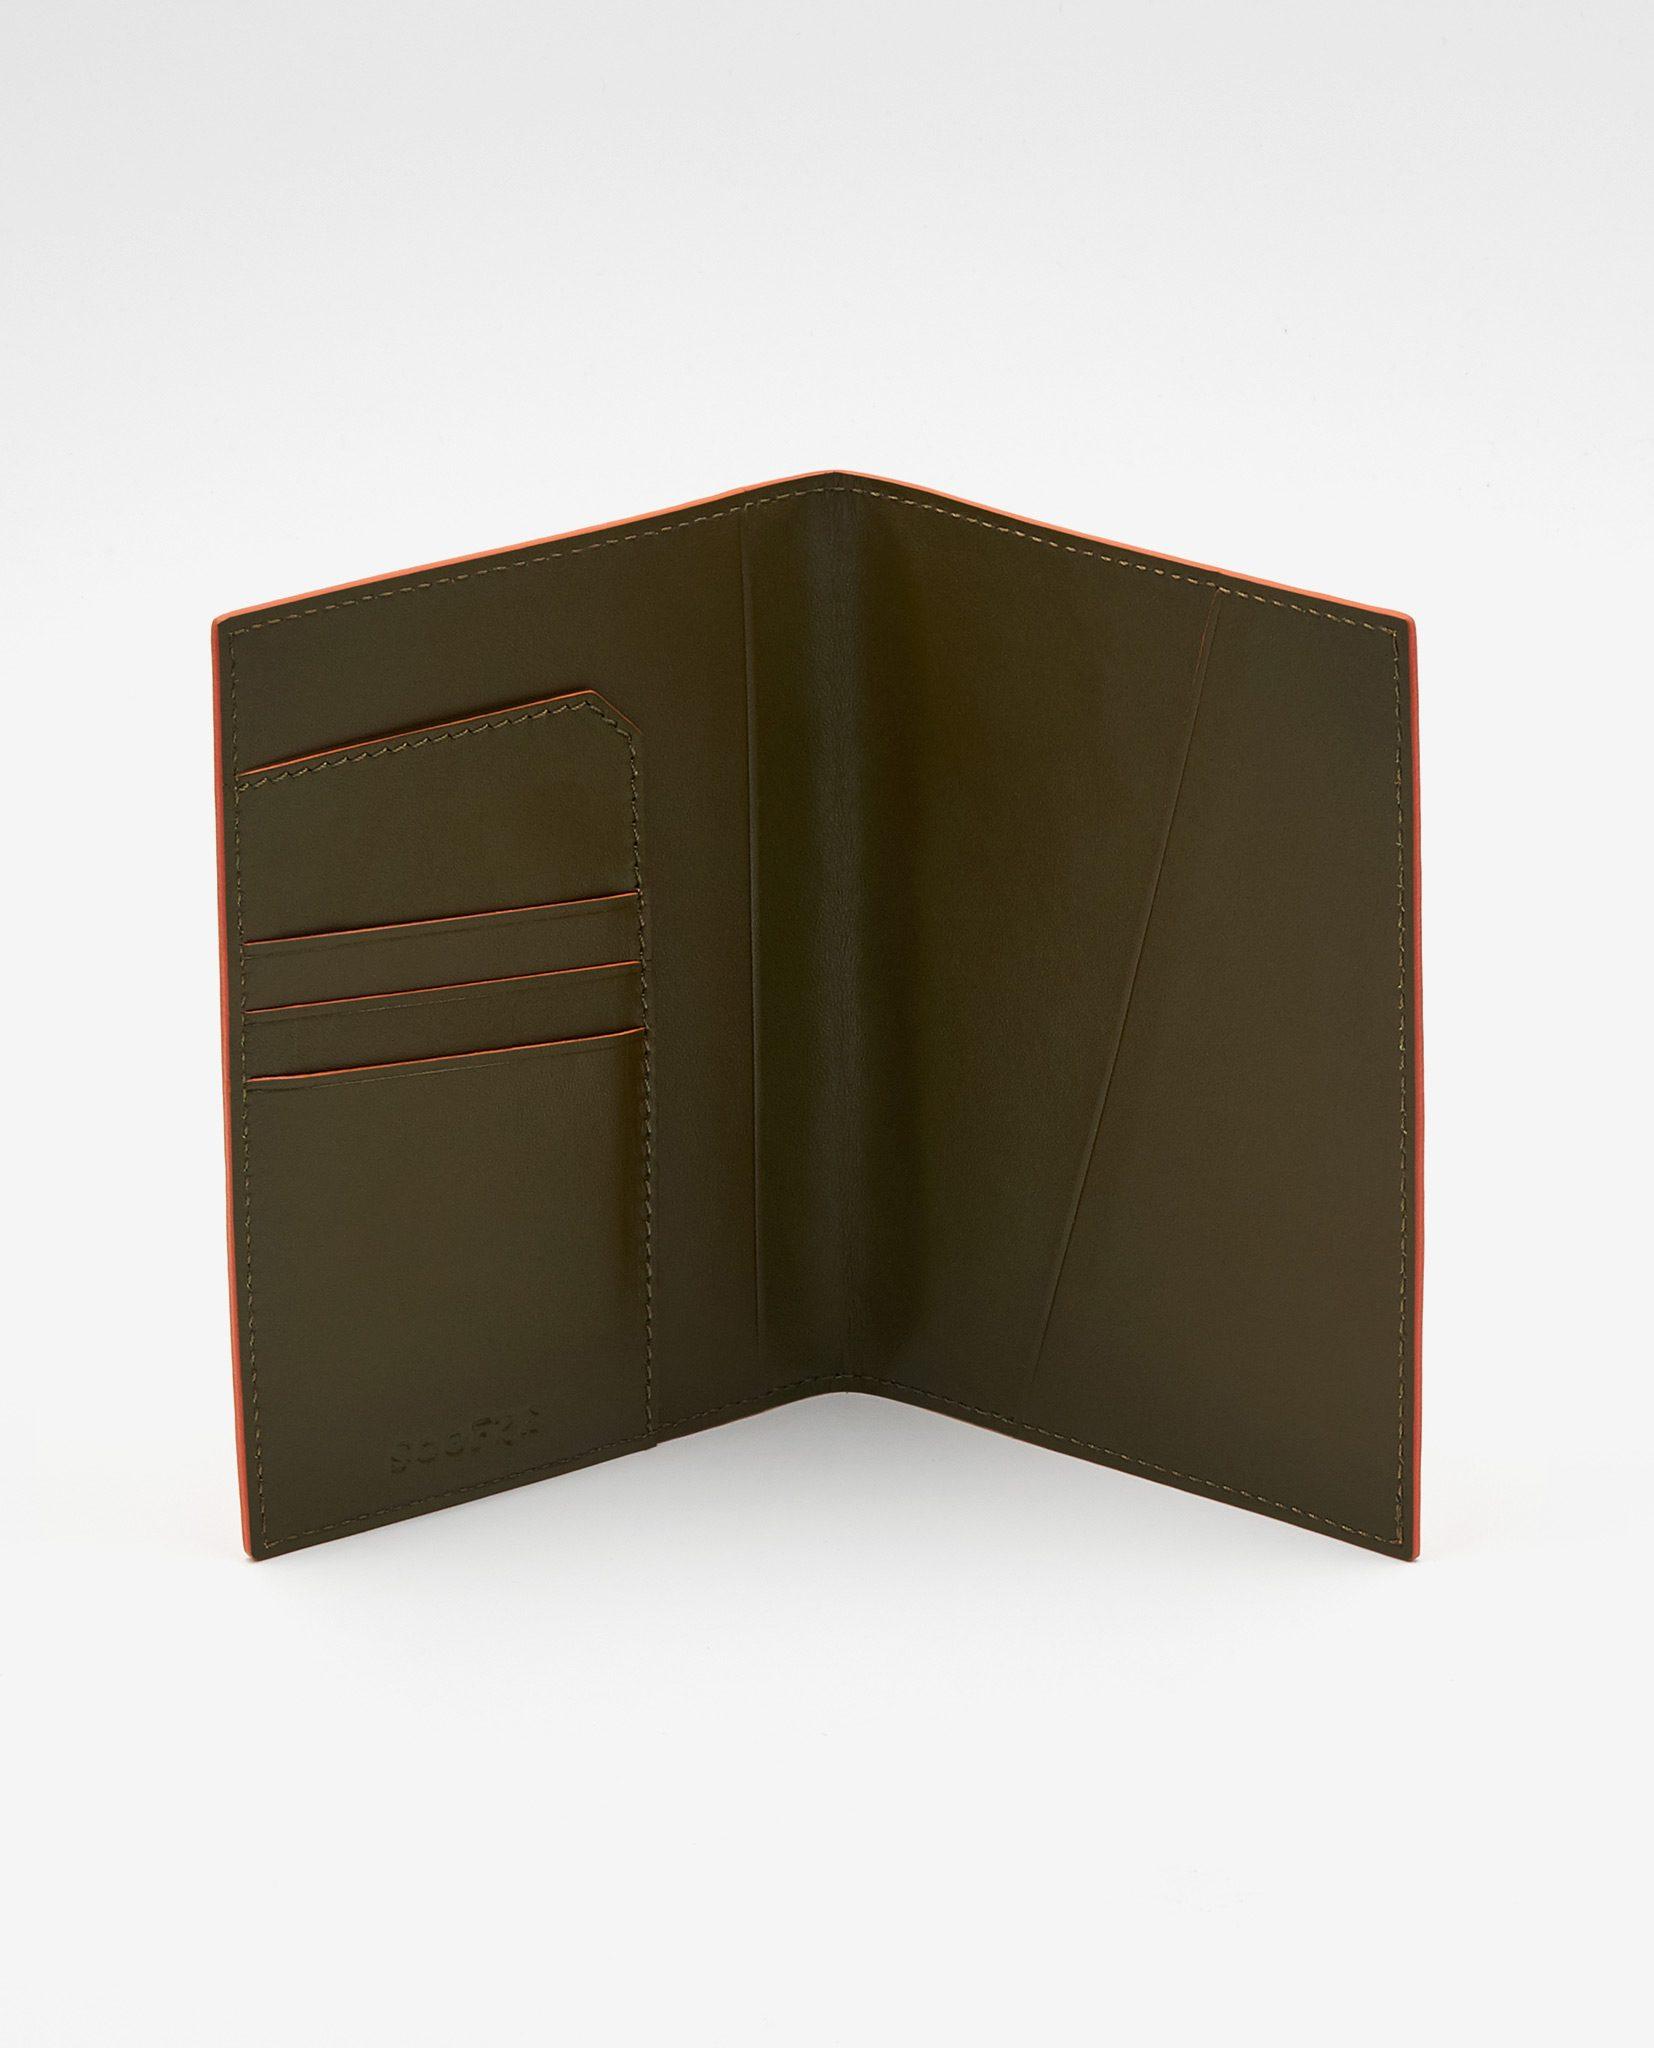 Soofre_Passport-Holder_Orange-Khaki-2